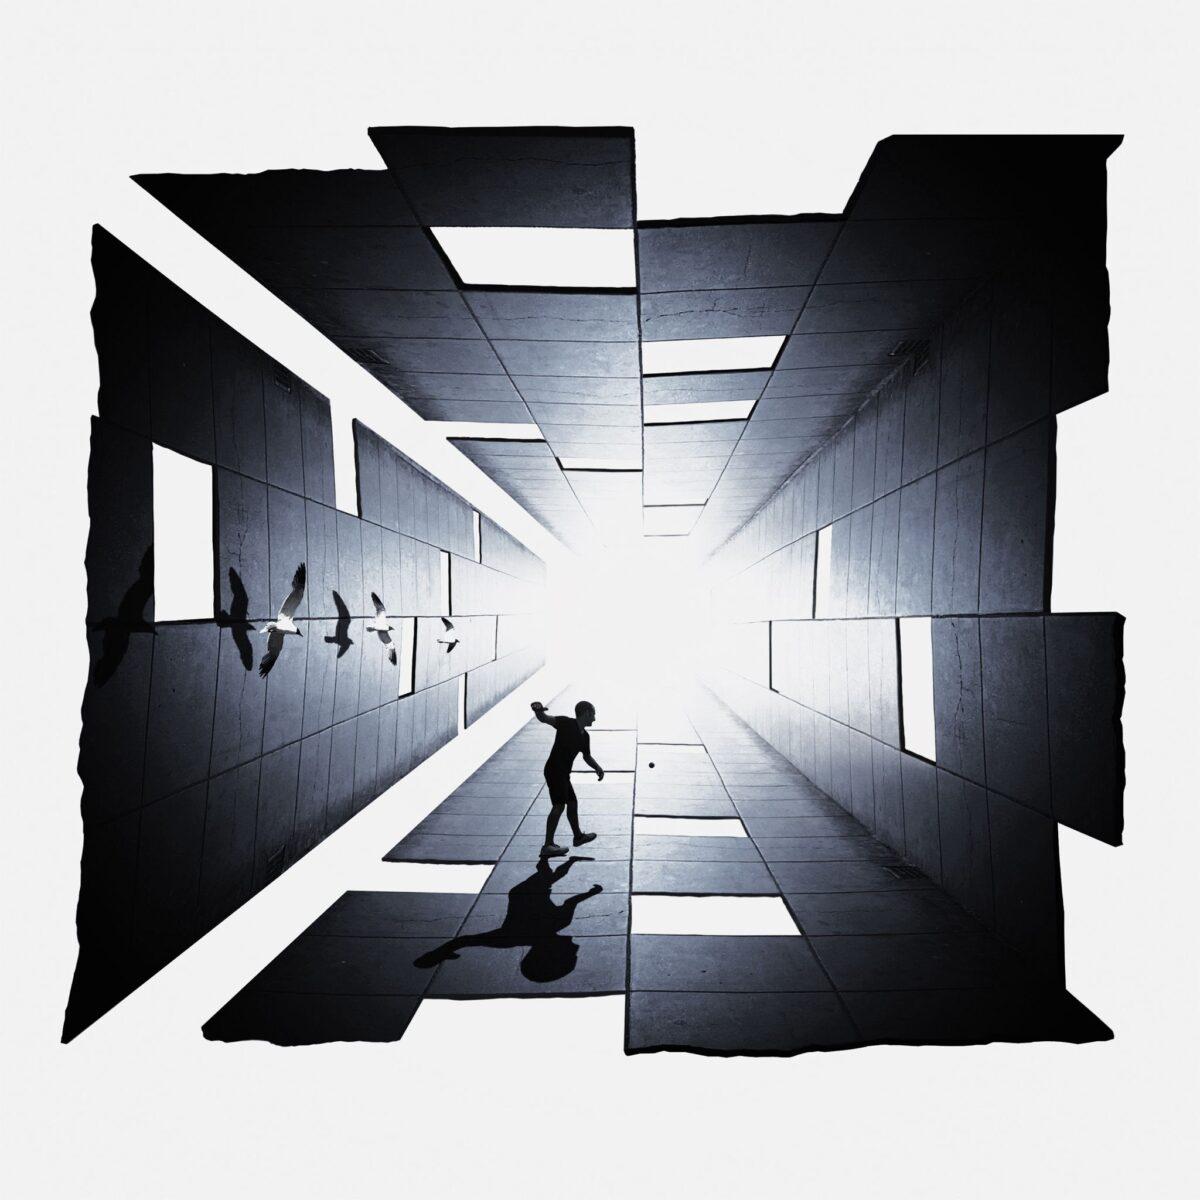 marron lanza su nuevo album in marron in cover artwork